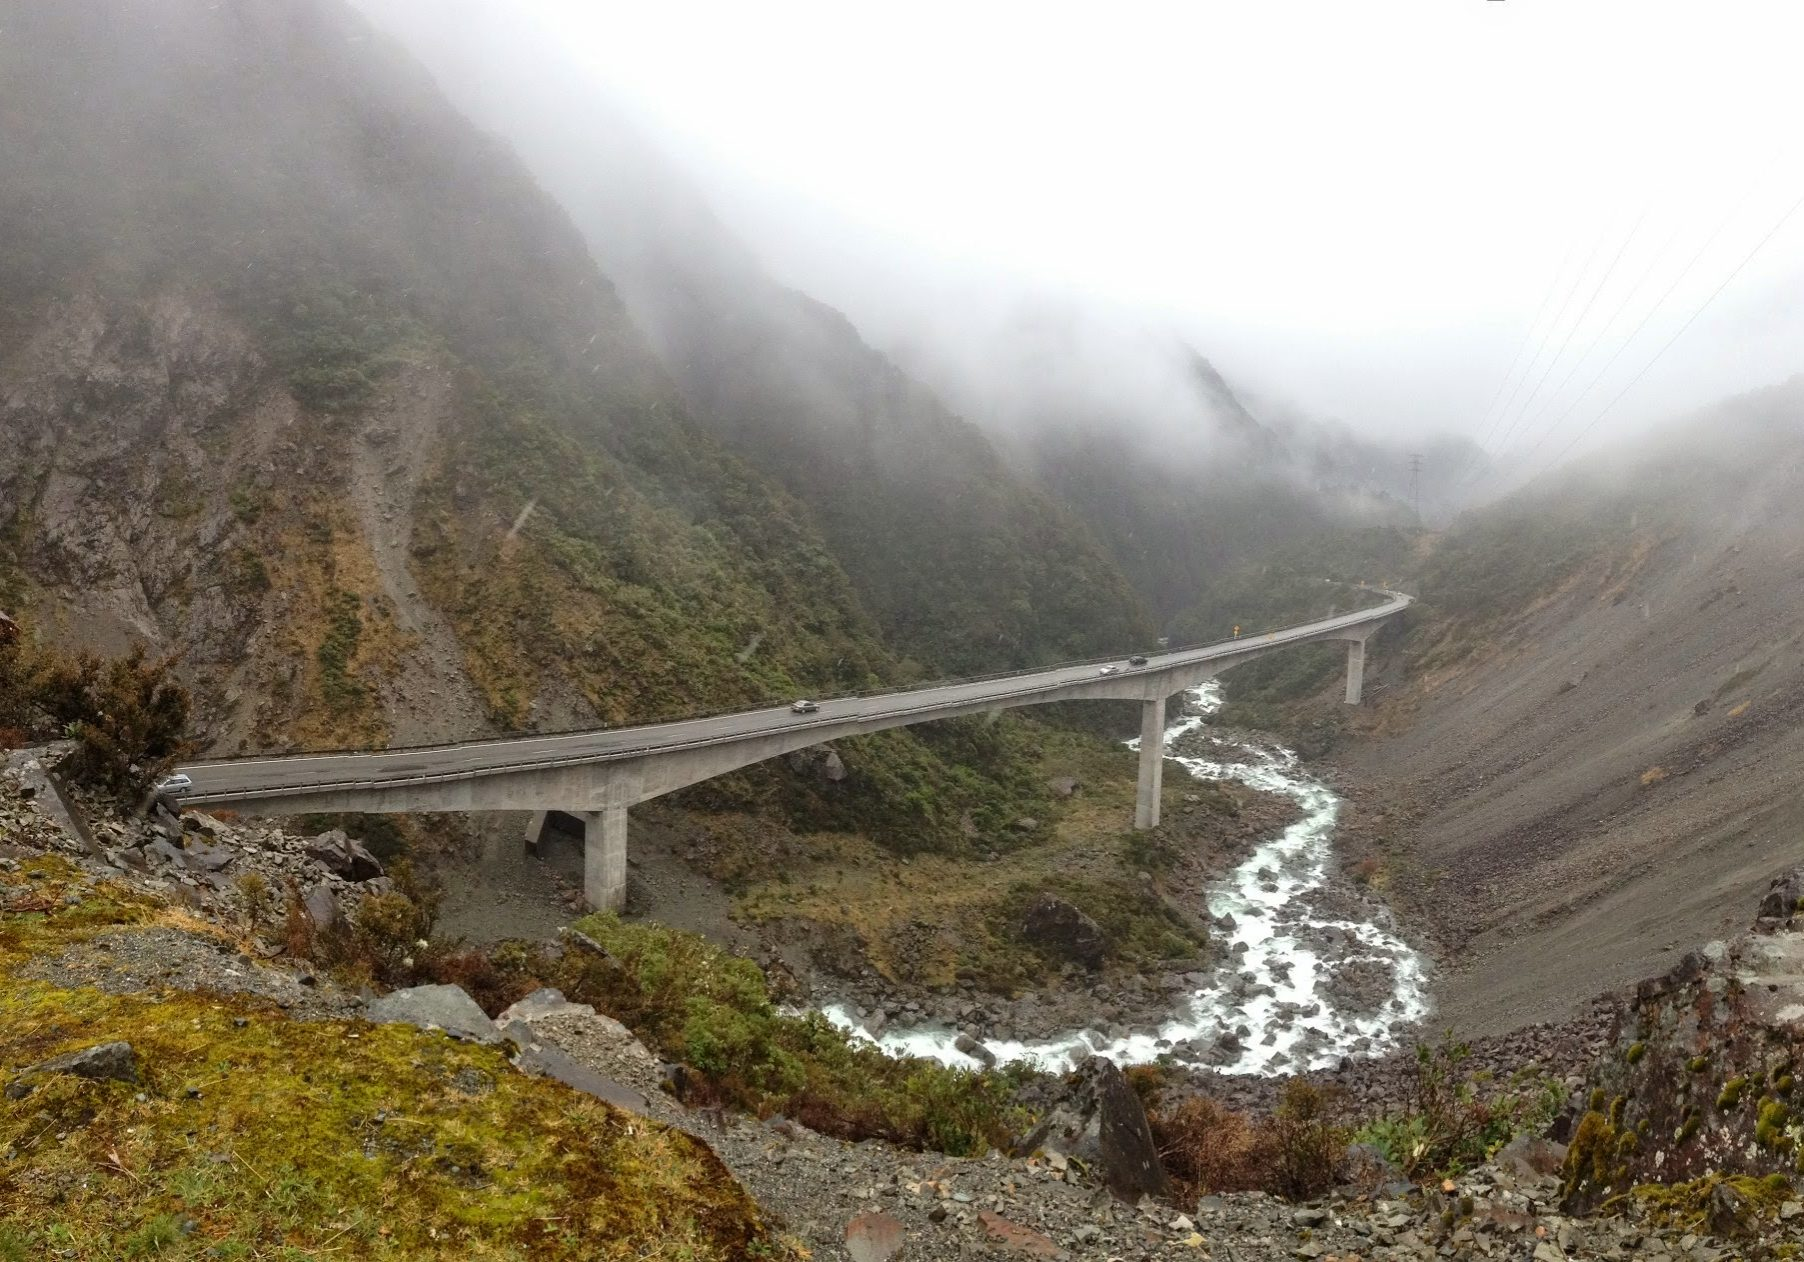 Arthur's Pass, south island, west coast, rainforest, new zealand, river, viaduct